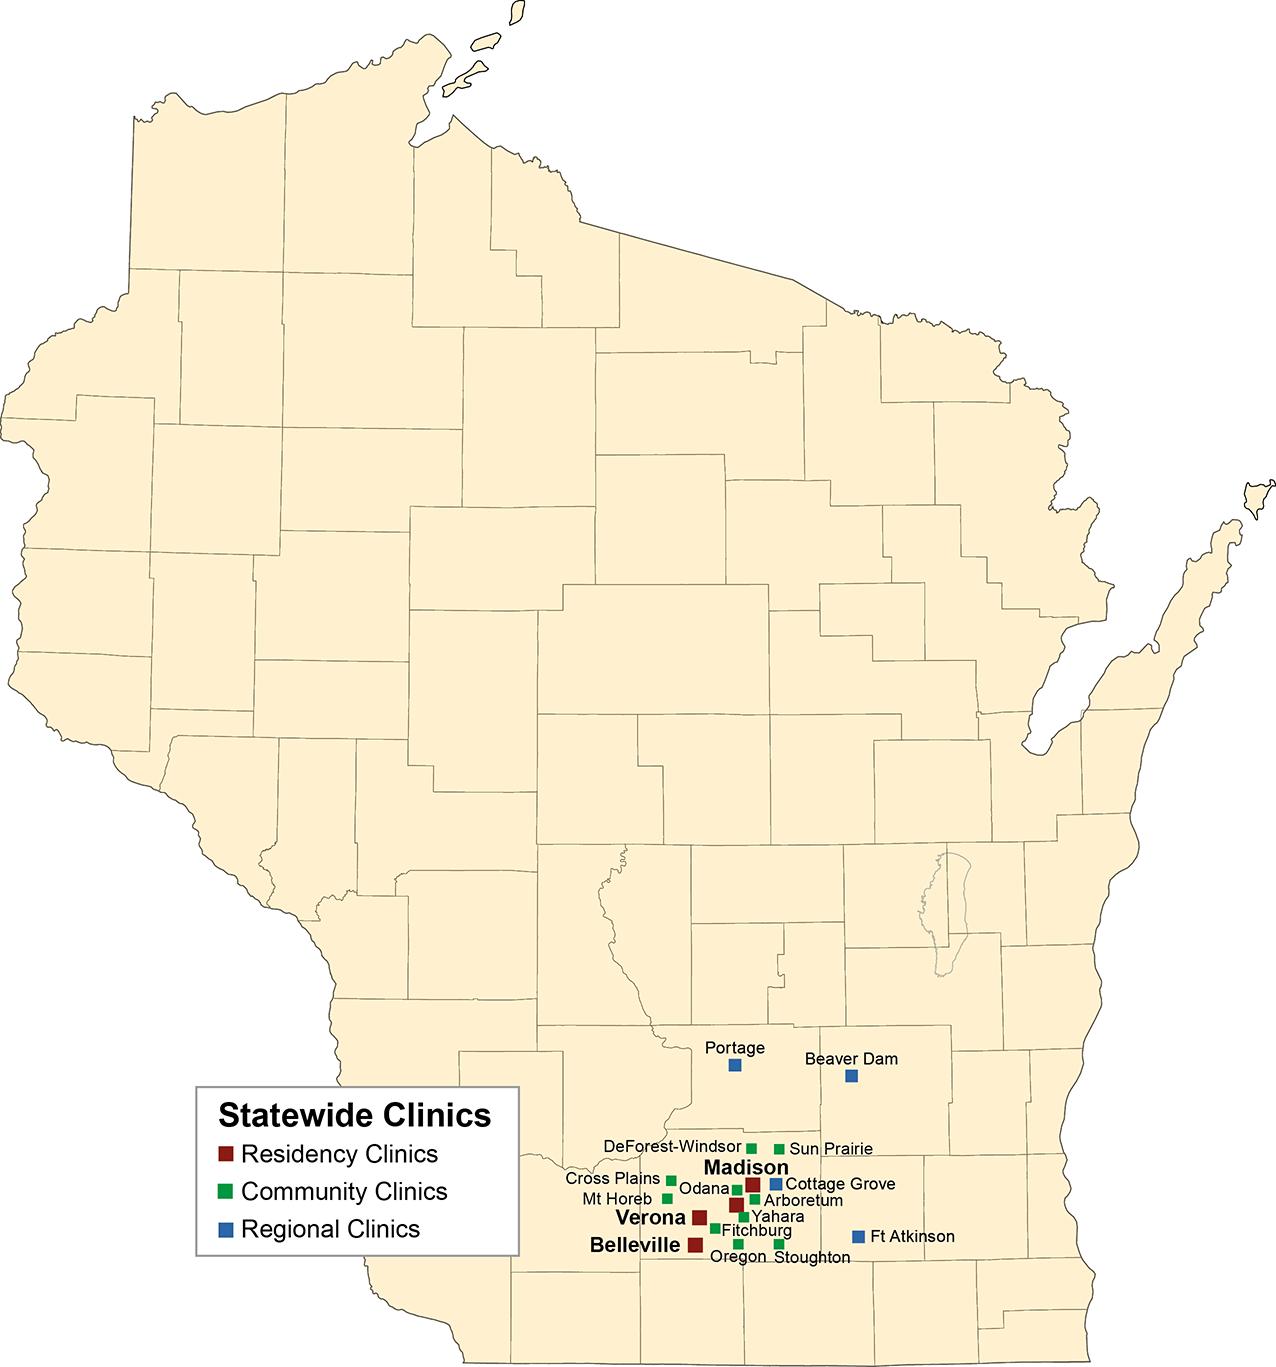 DFMCH Clinics Map